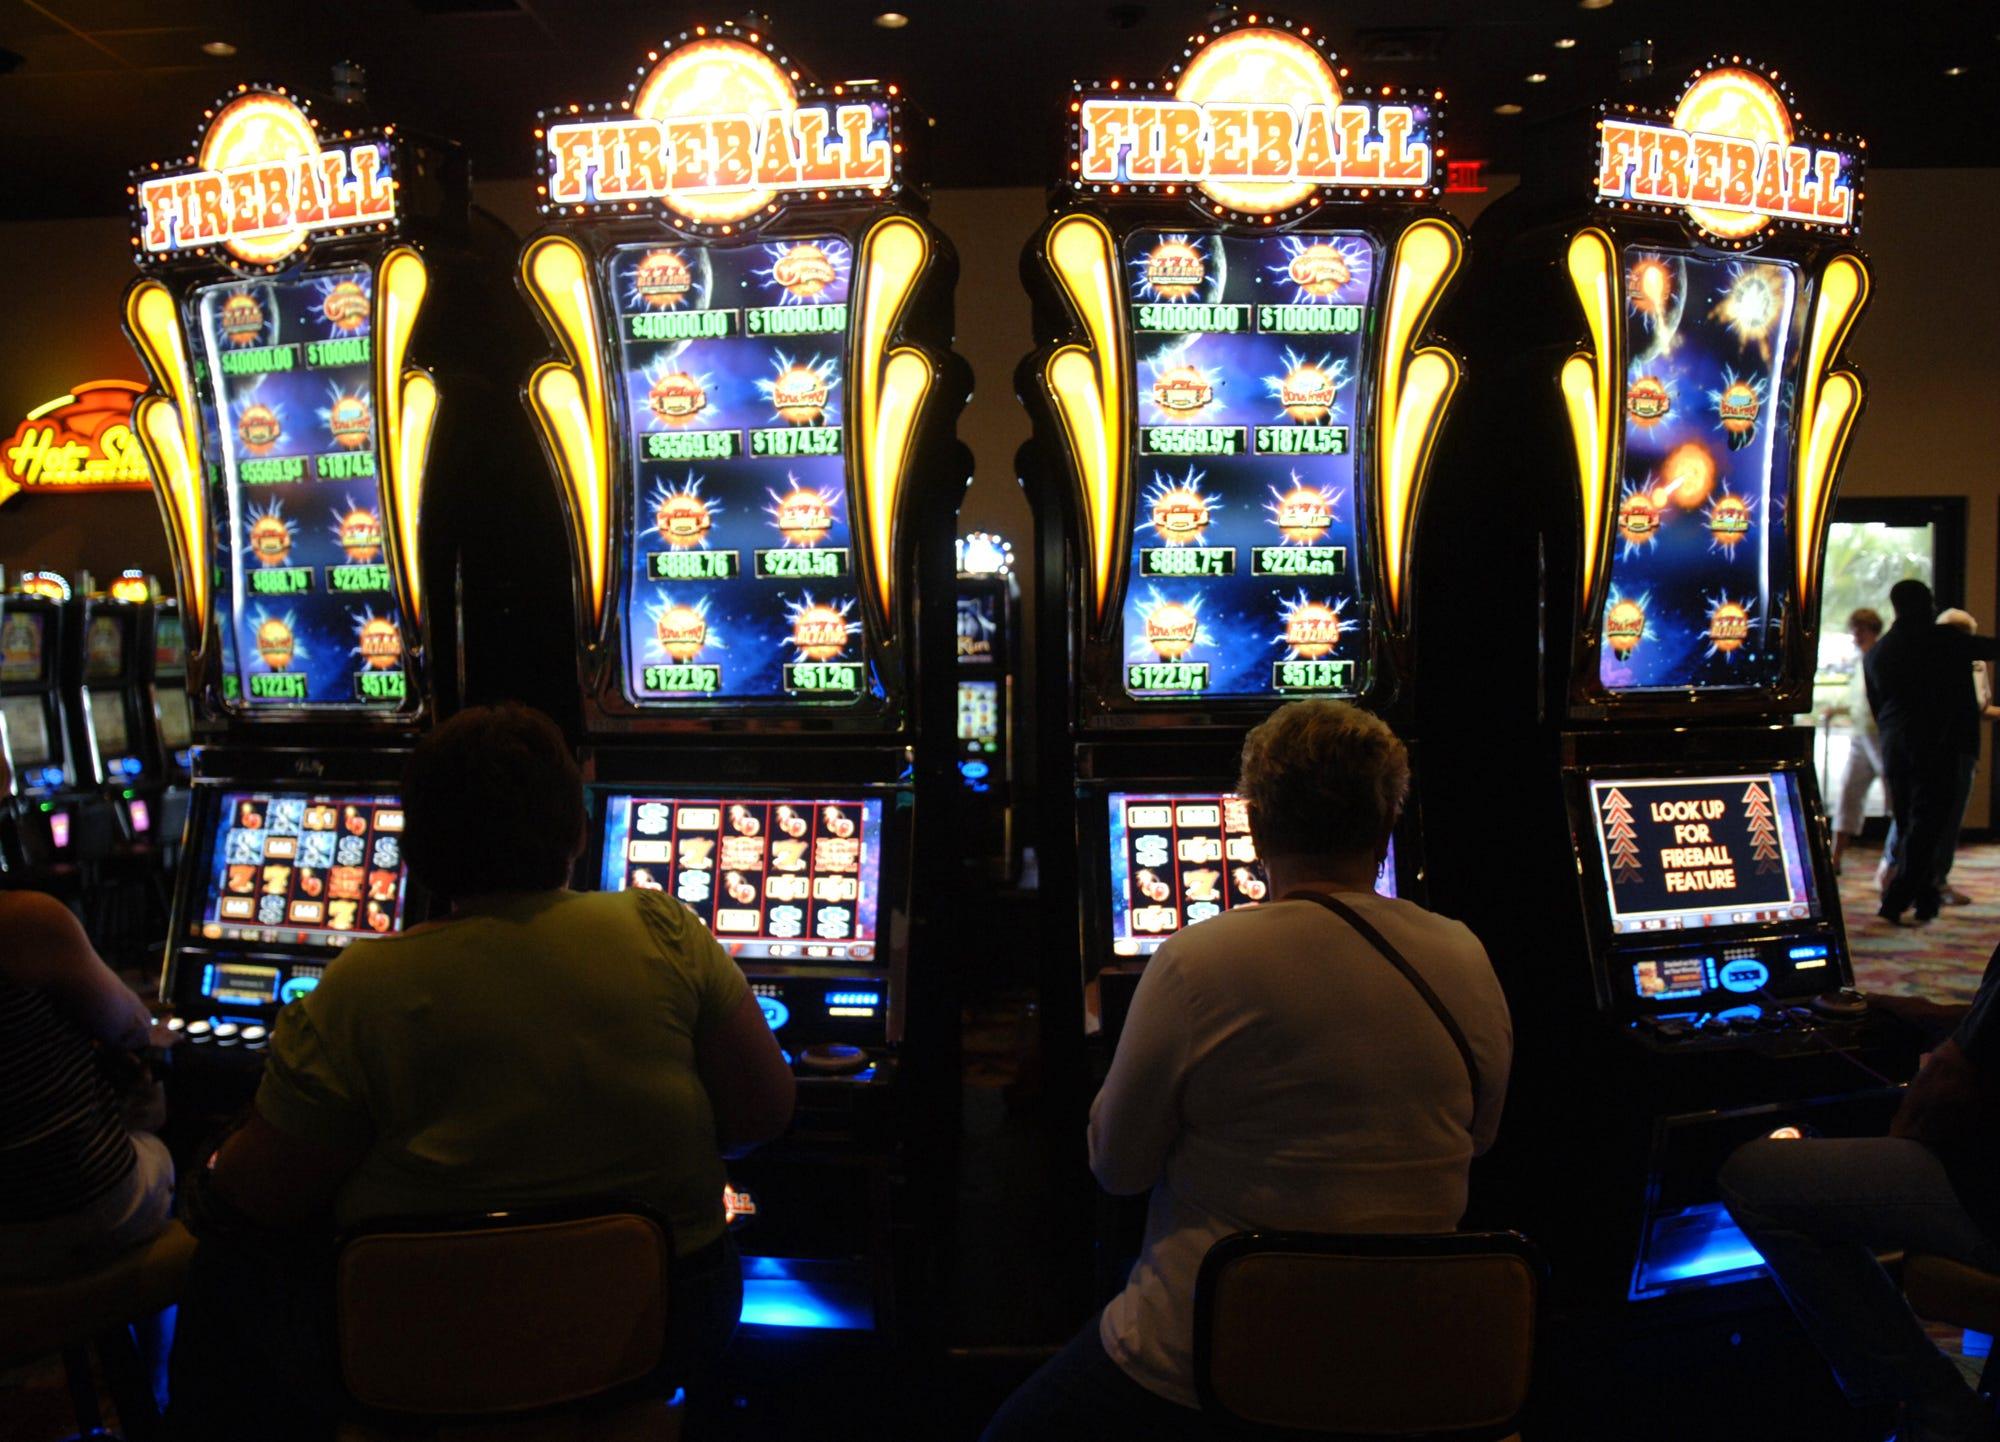 Florida legal gambling appelate court no gambling online poker for kids